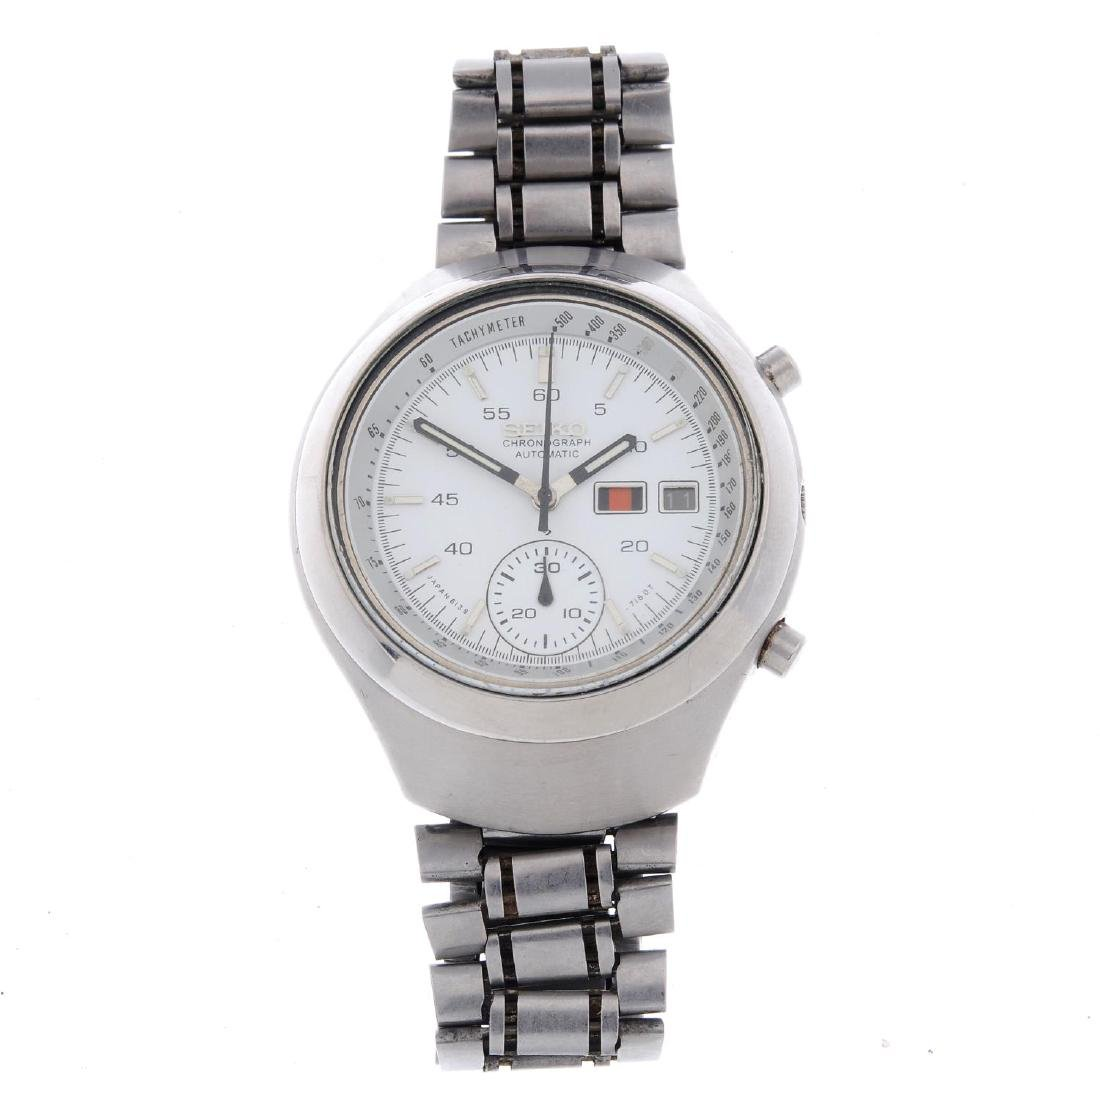 SEIKO - a gentleman's chronograph bracelet watch.